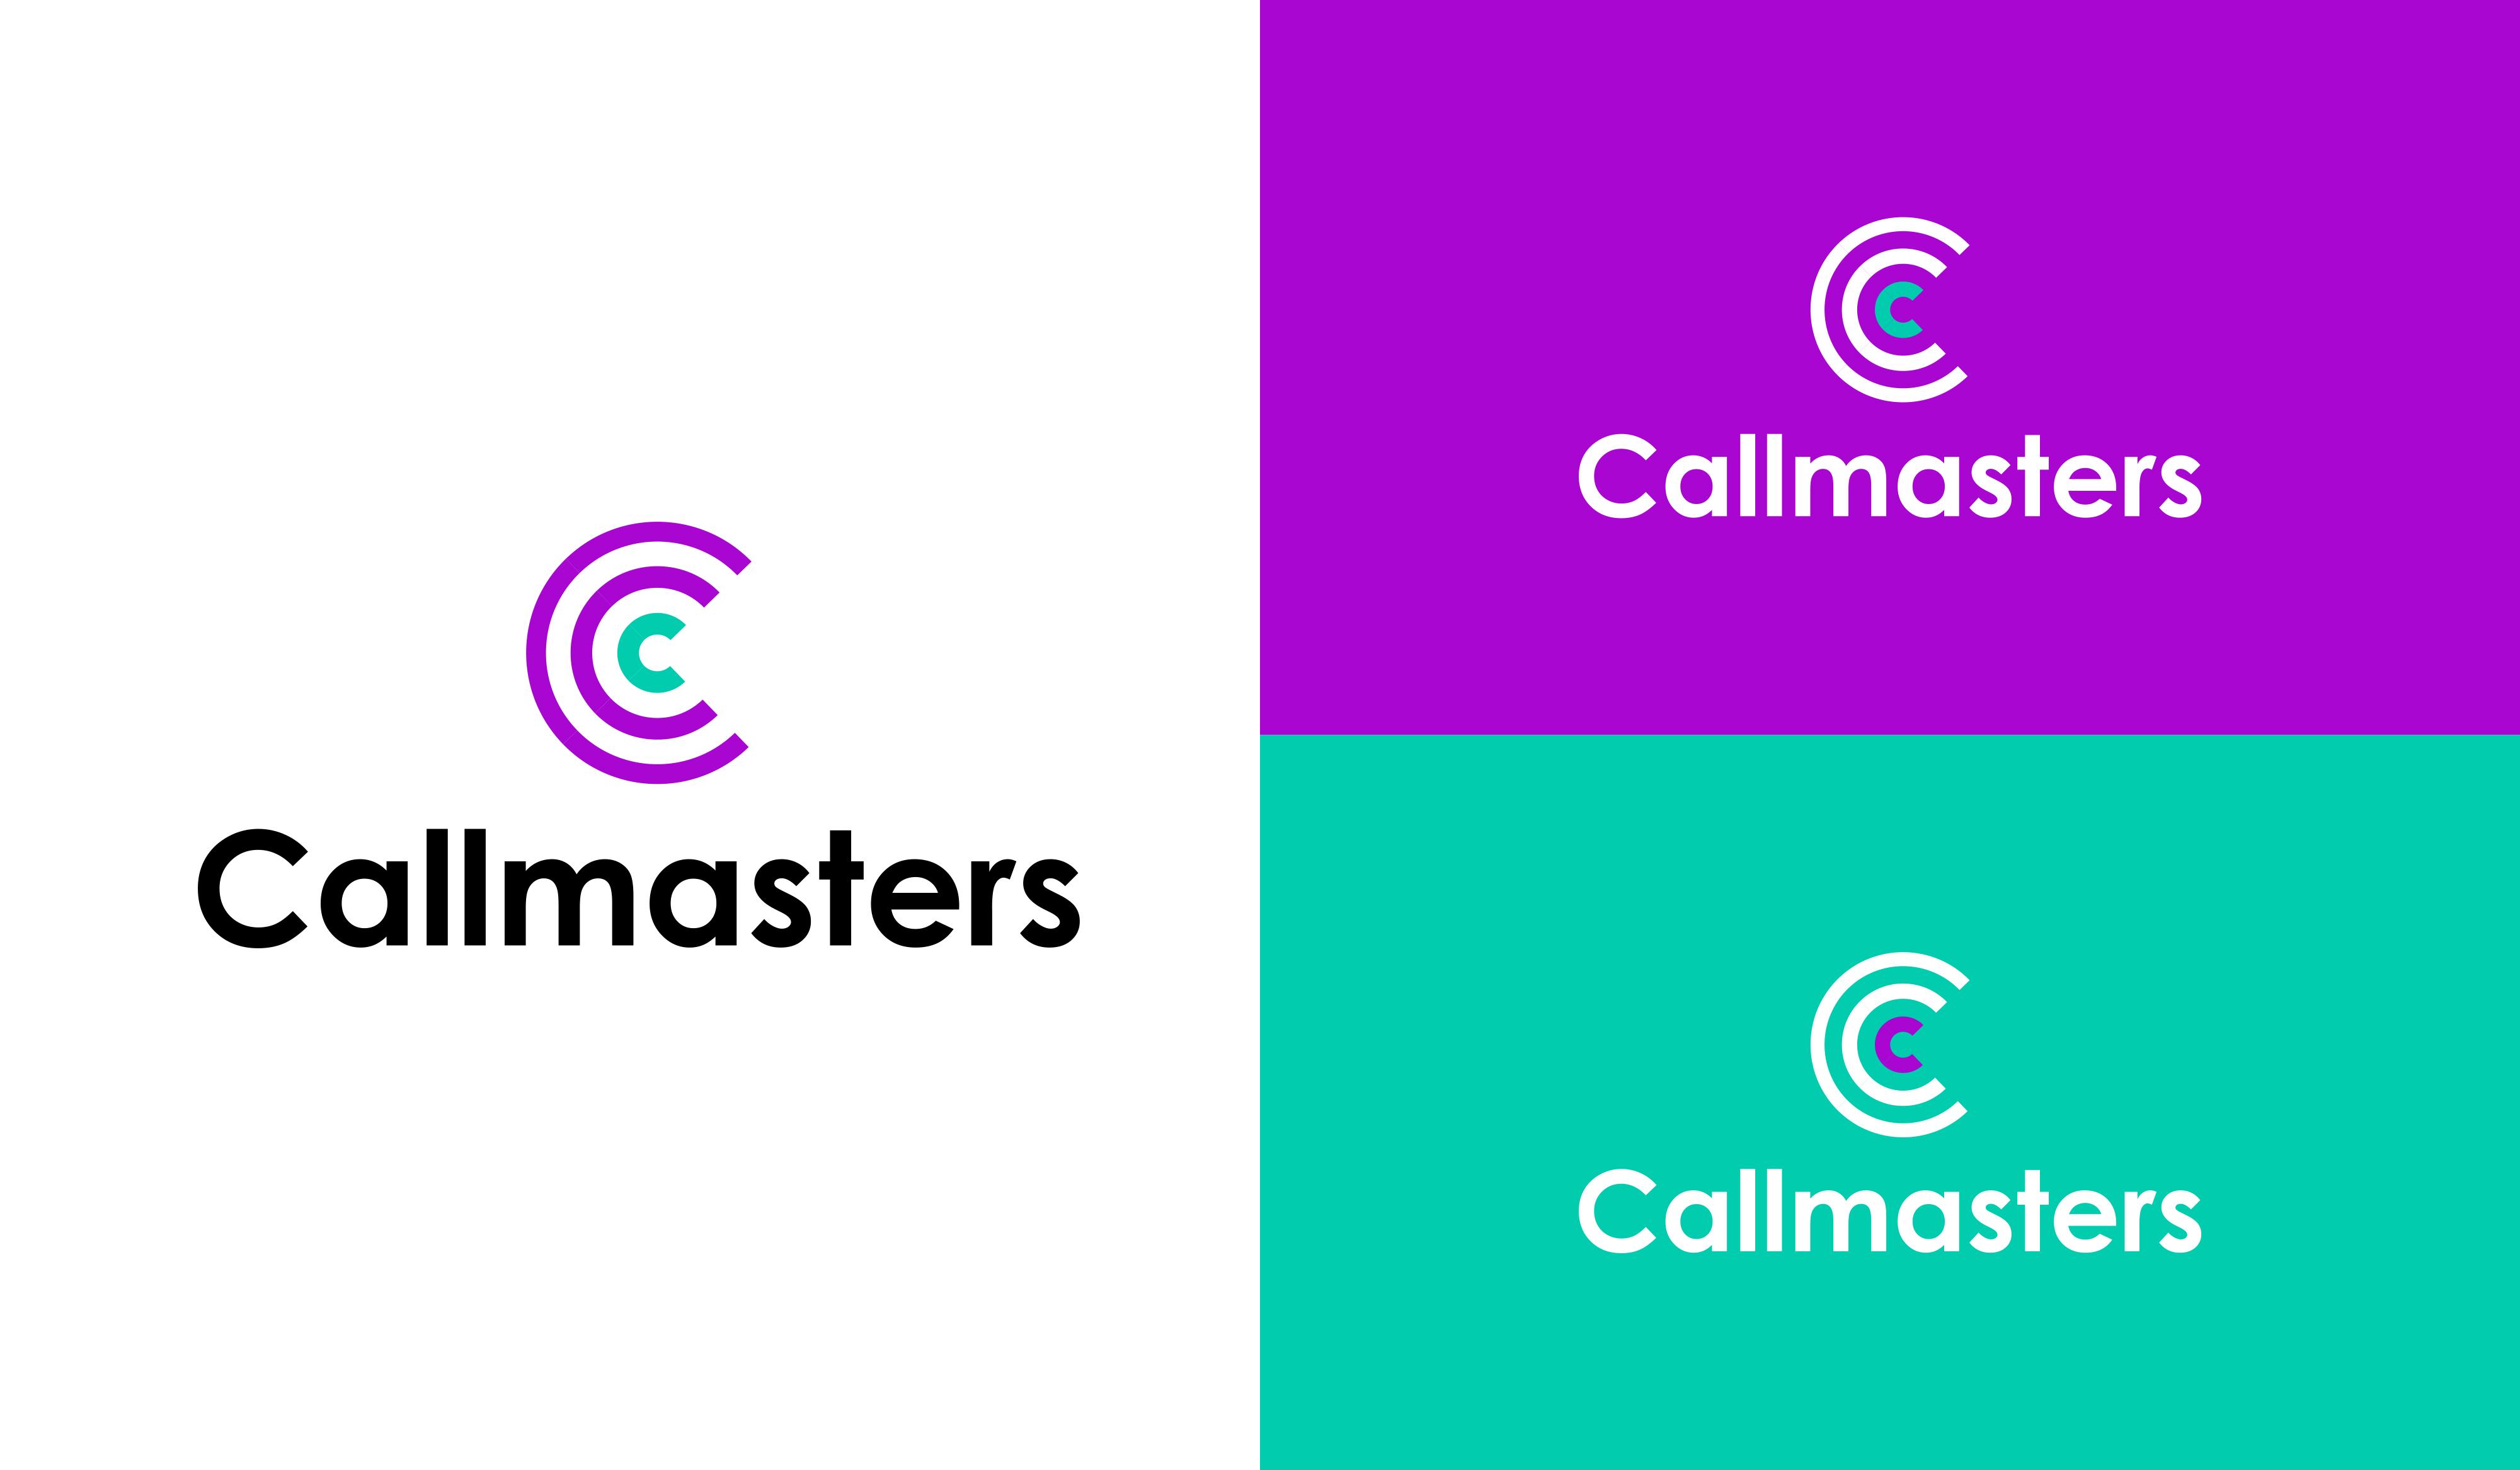 Логотип call-центра Callmasters  фото f_7215b6ed5bc5adf4.jpg